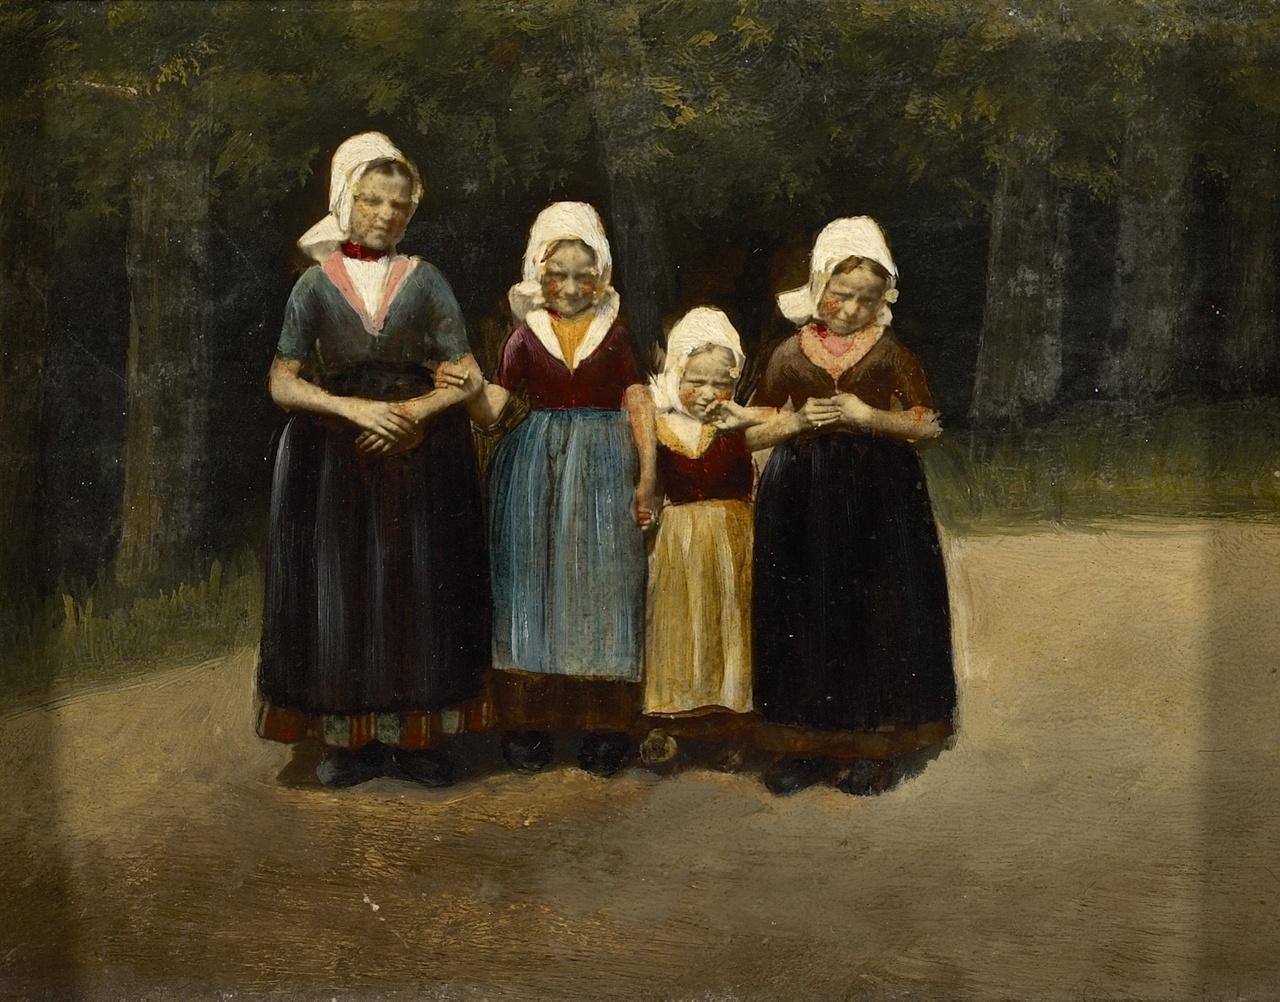 Vier Walcherse meisjes, Anoniem